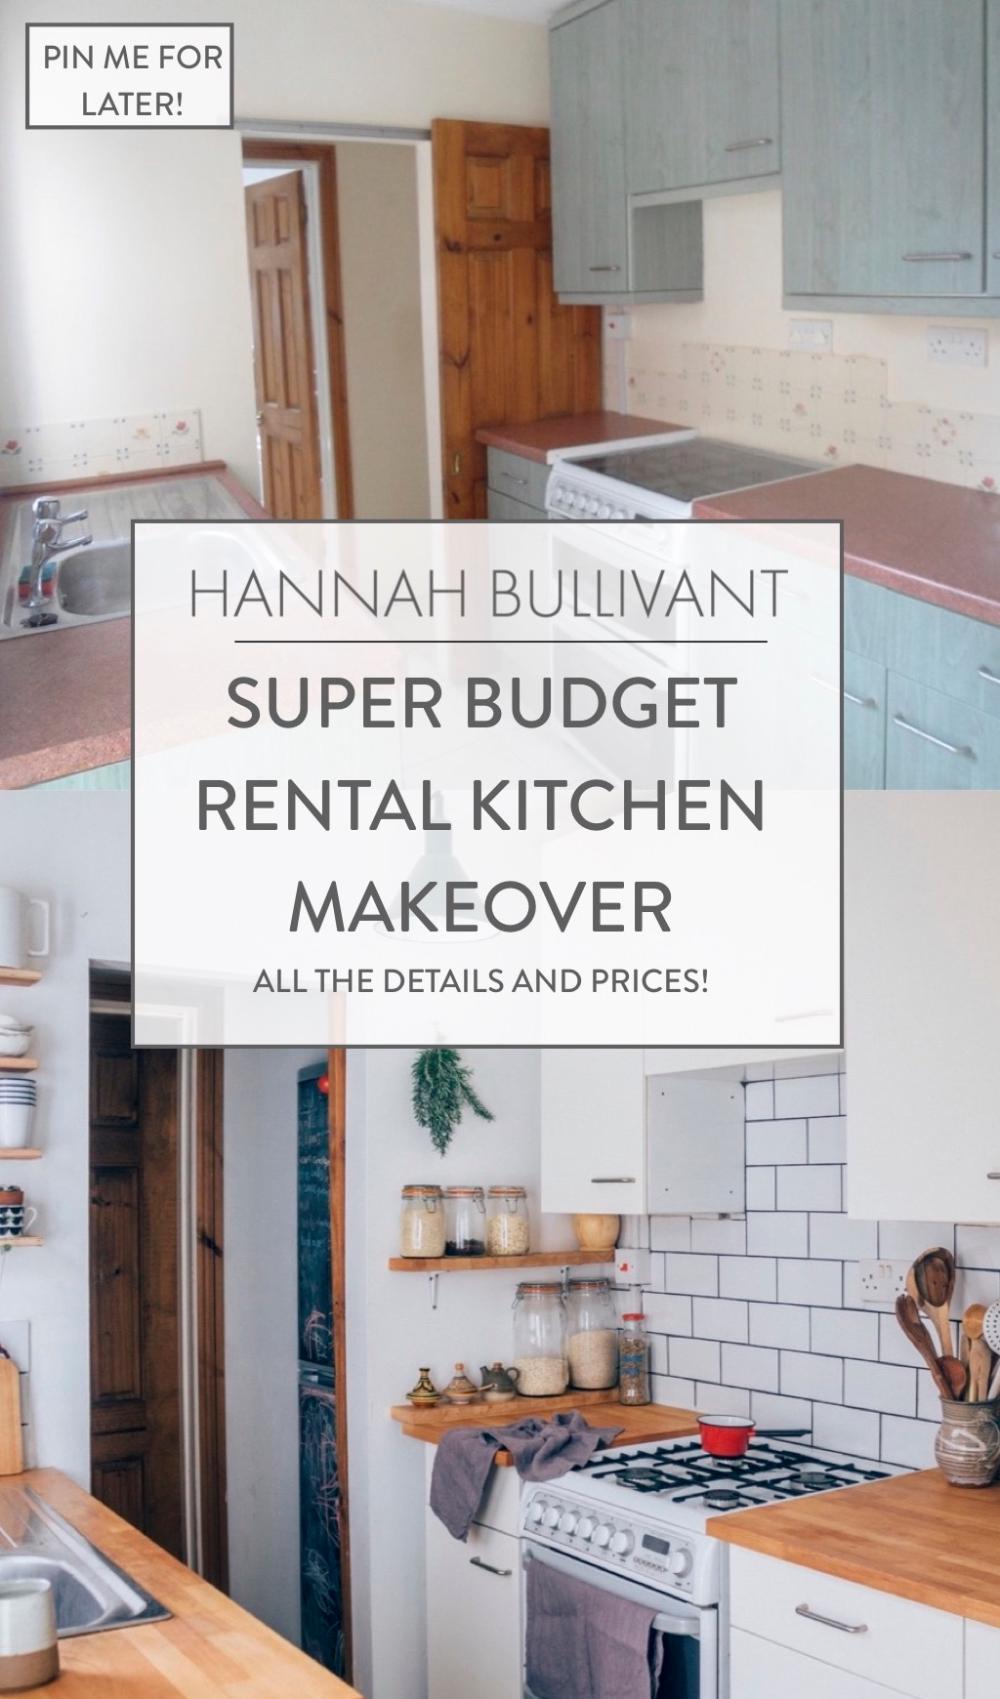 Super Budget Rental Kitchen Makeover Hannah Bullivant Seasonal Interior Stylist Decluttering Expert In 2020 Rental Kitchen Makeover Budget Kitchen Makeover Rental Kitchen